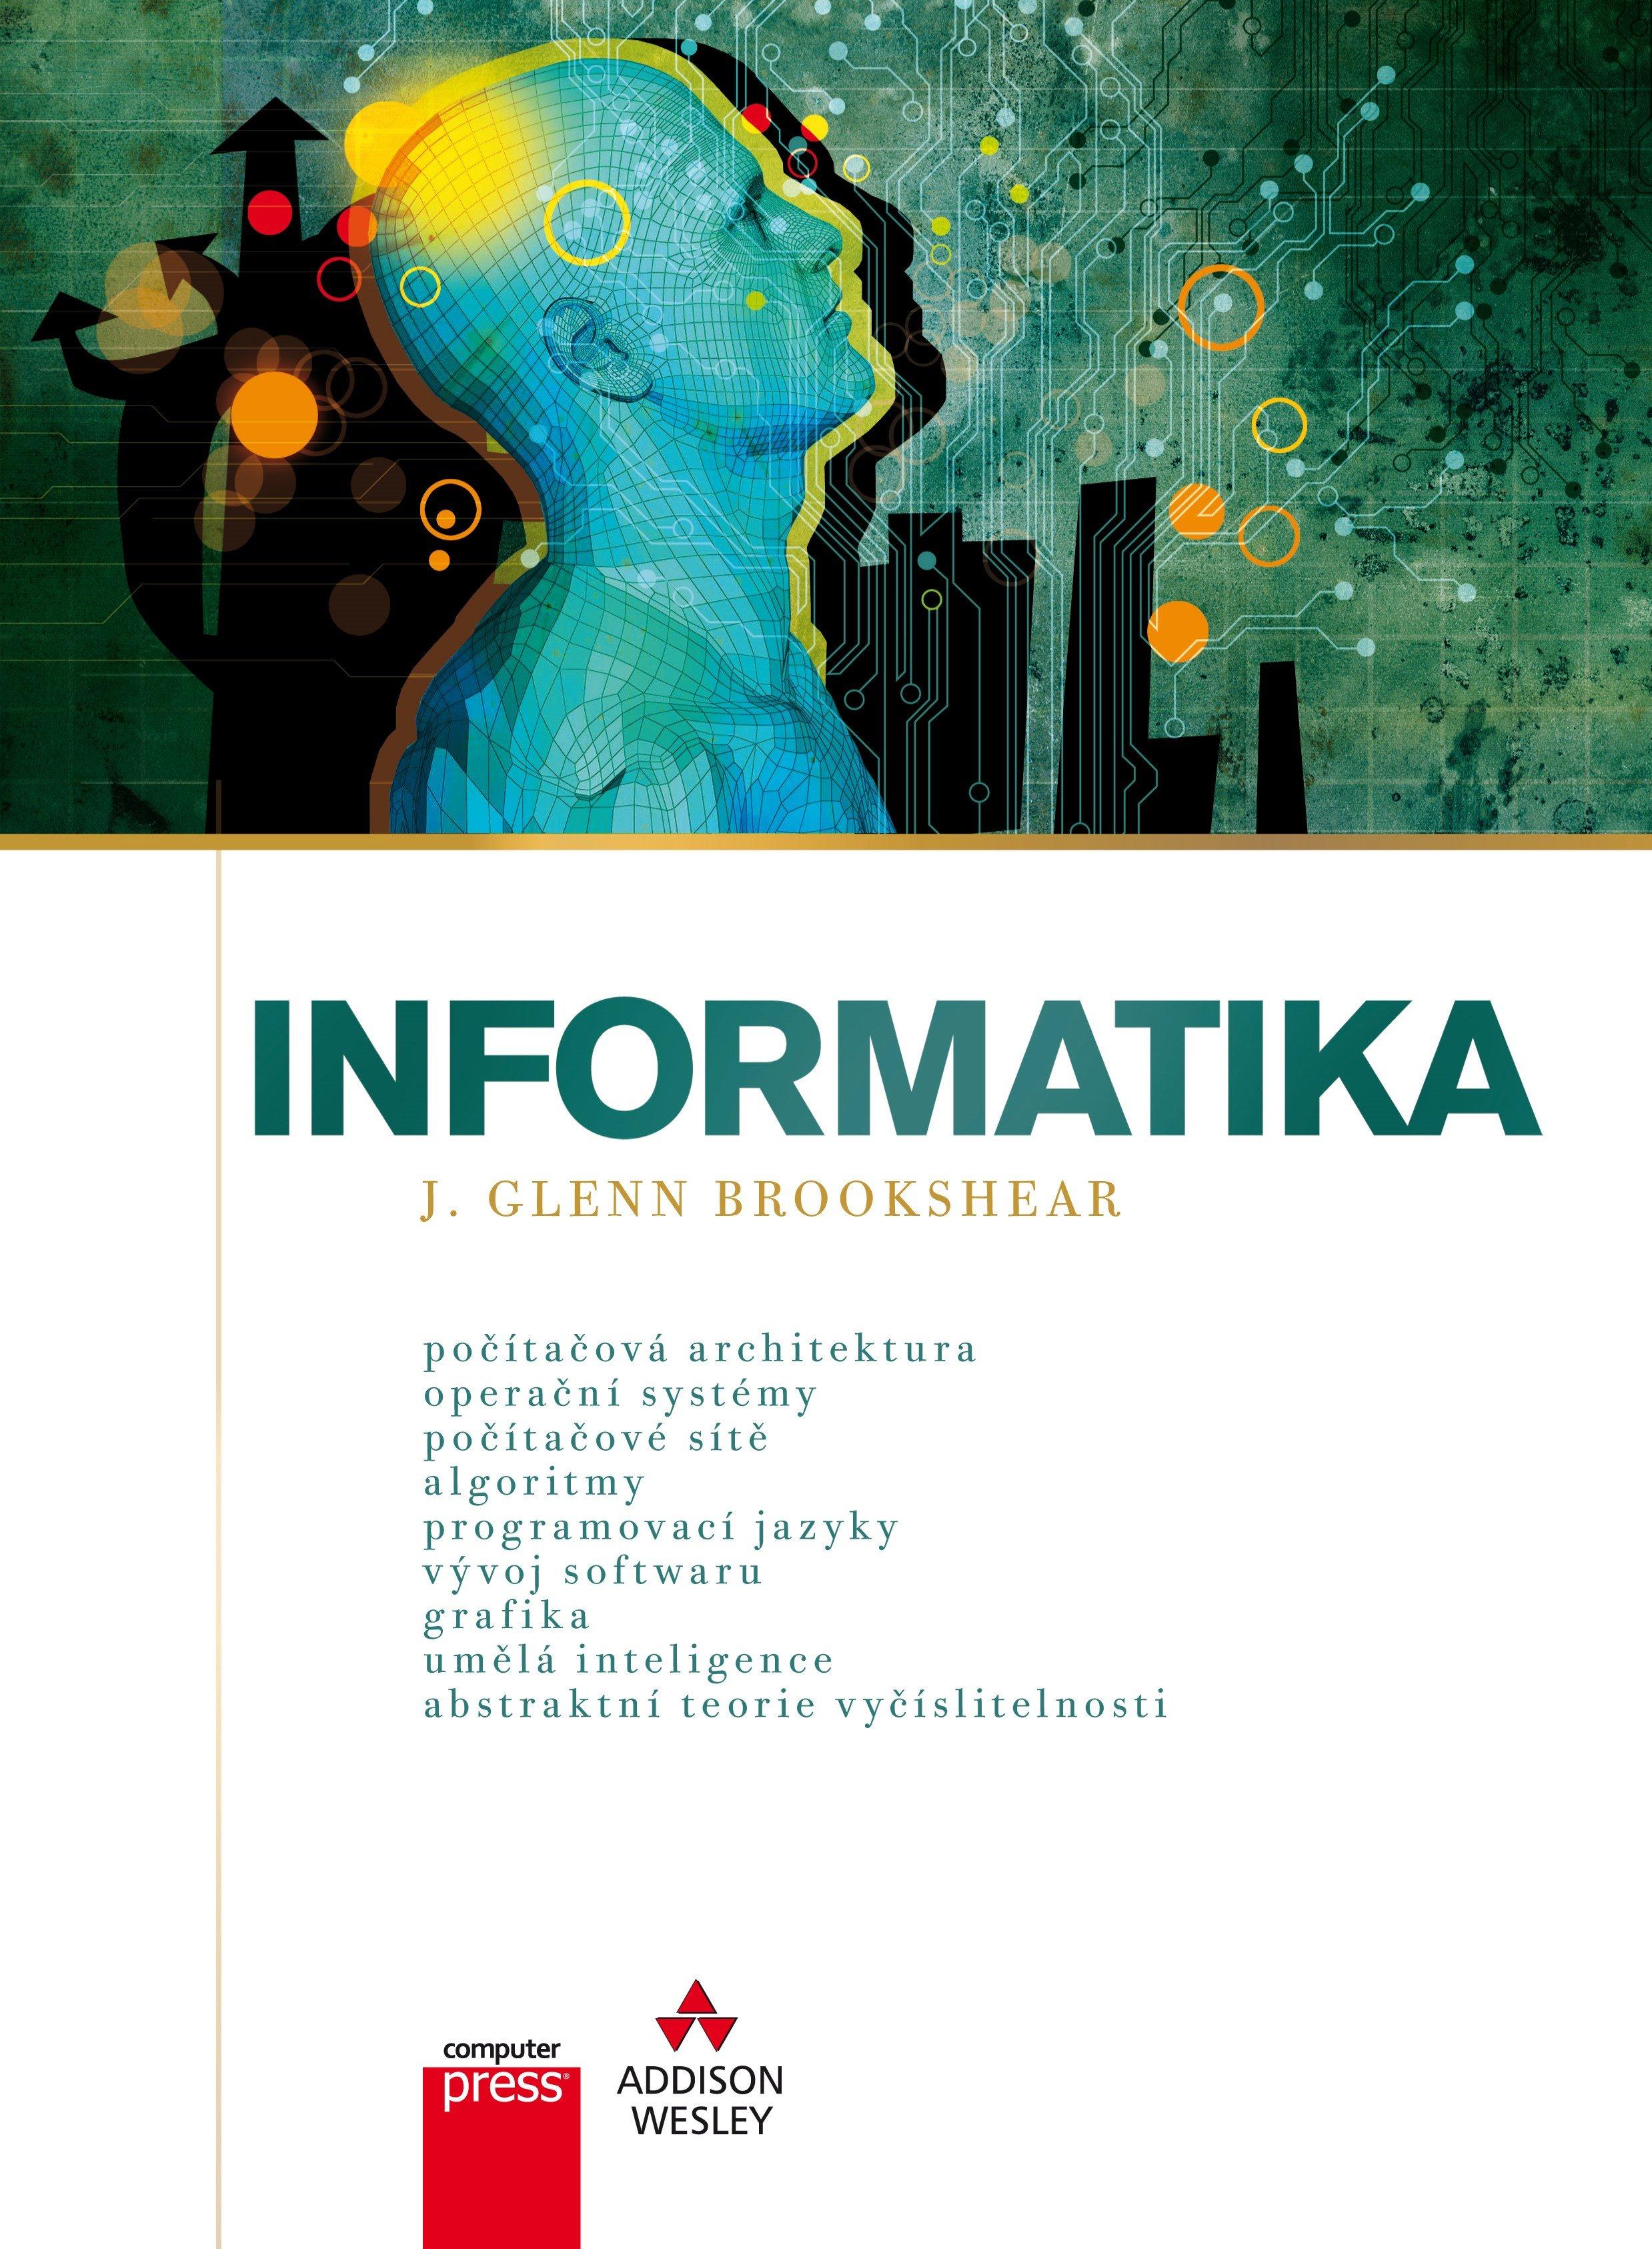 Informatika - J.Glenn Brookshear